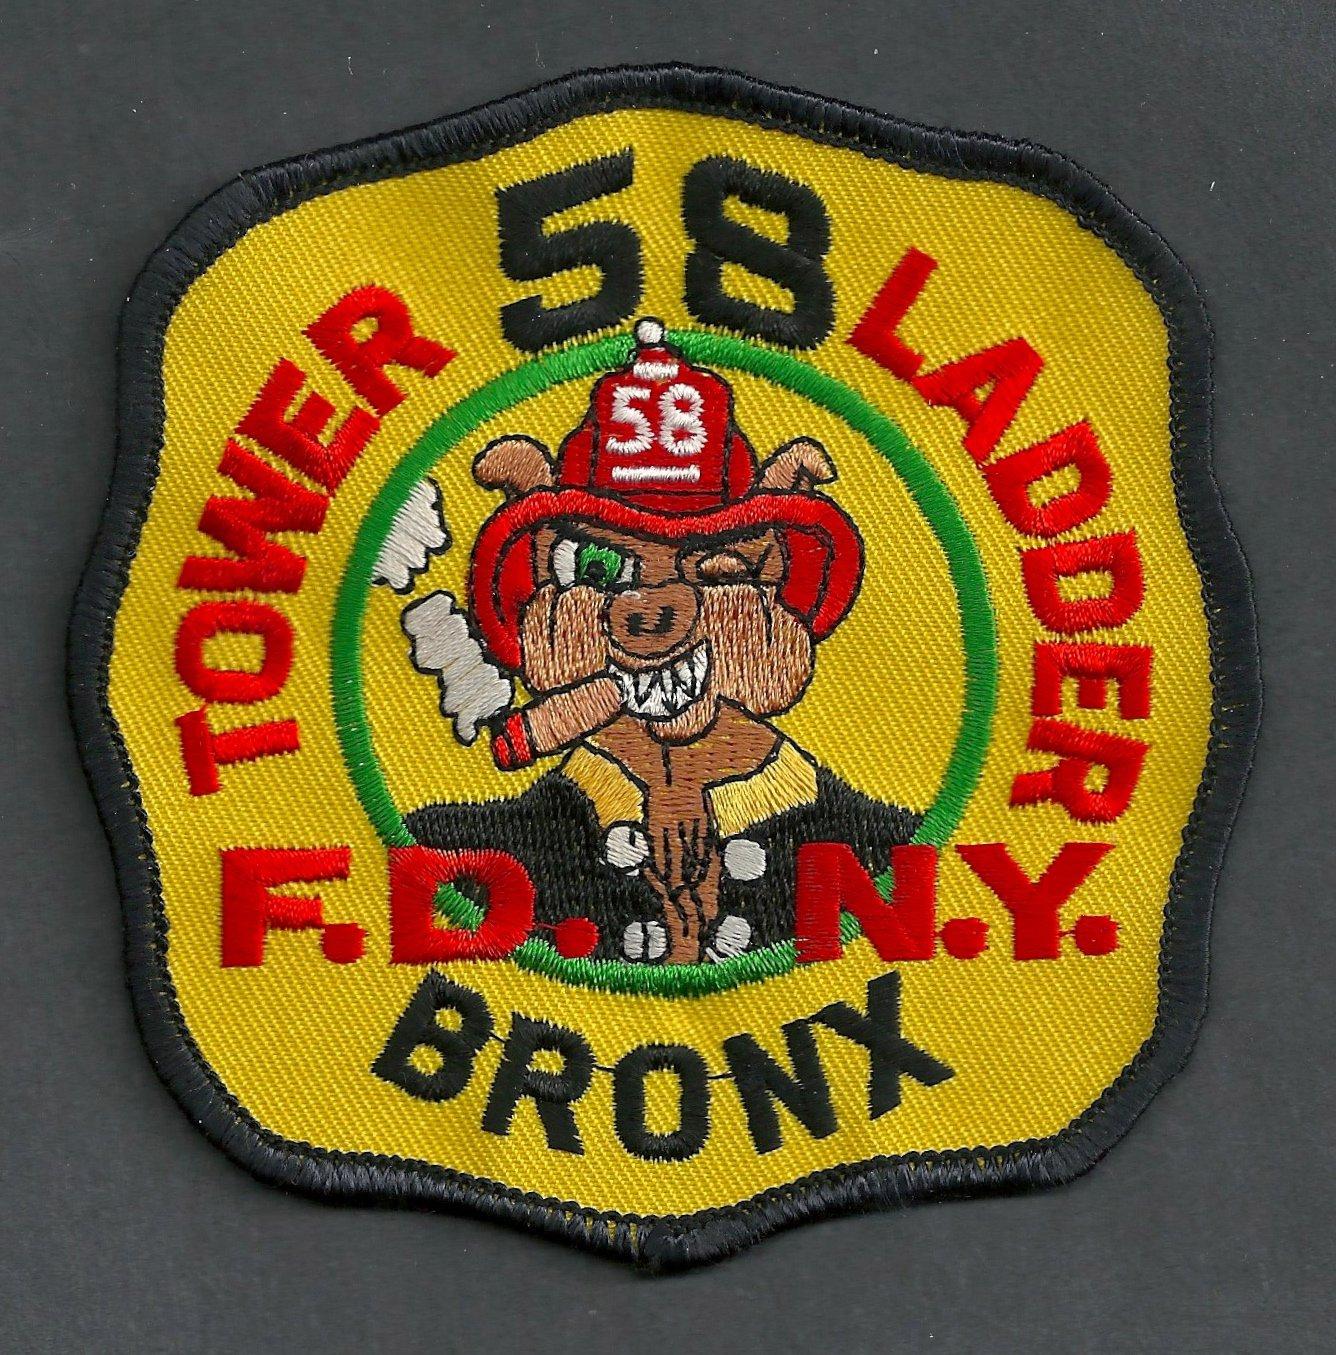 Bronx New York Ladder Company 58 Fire Patch